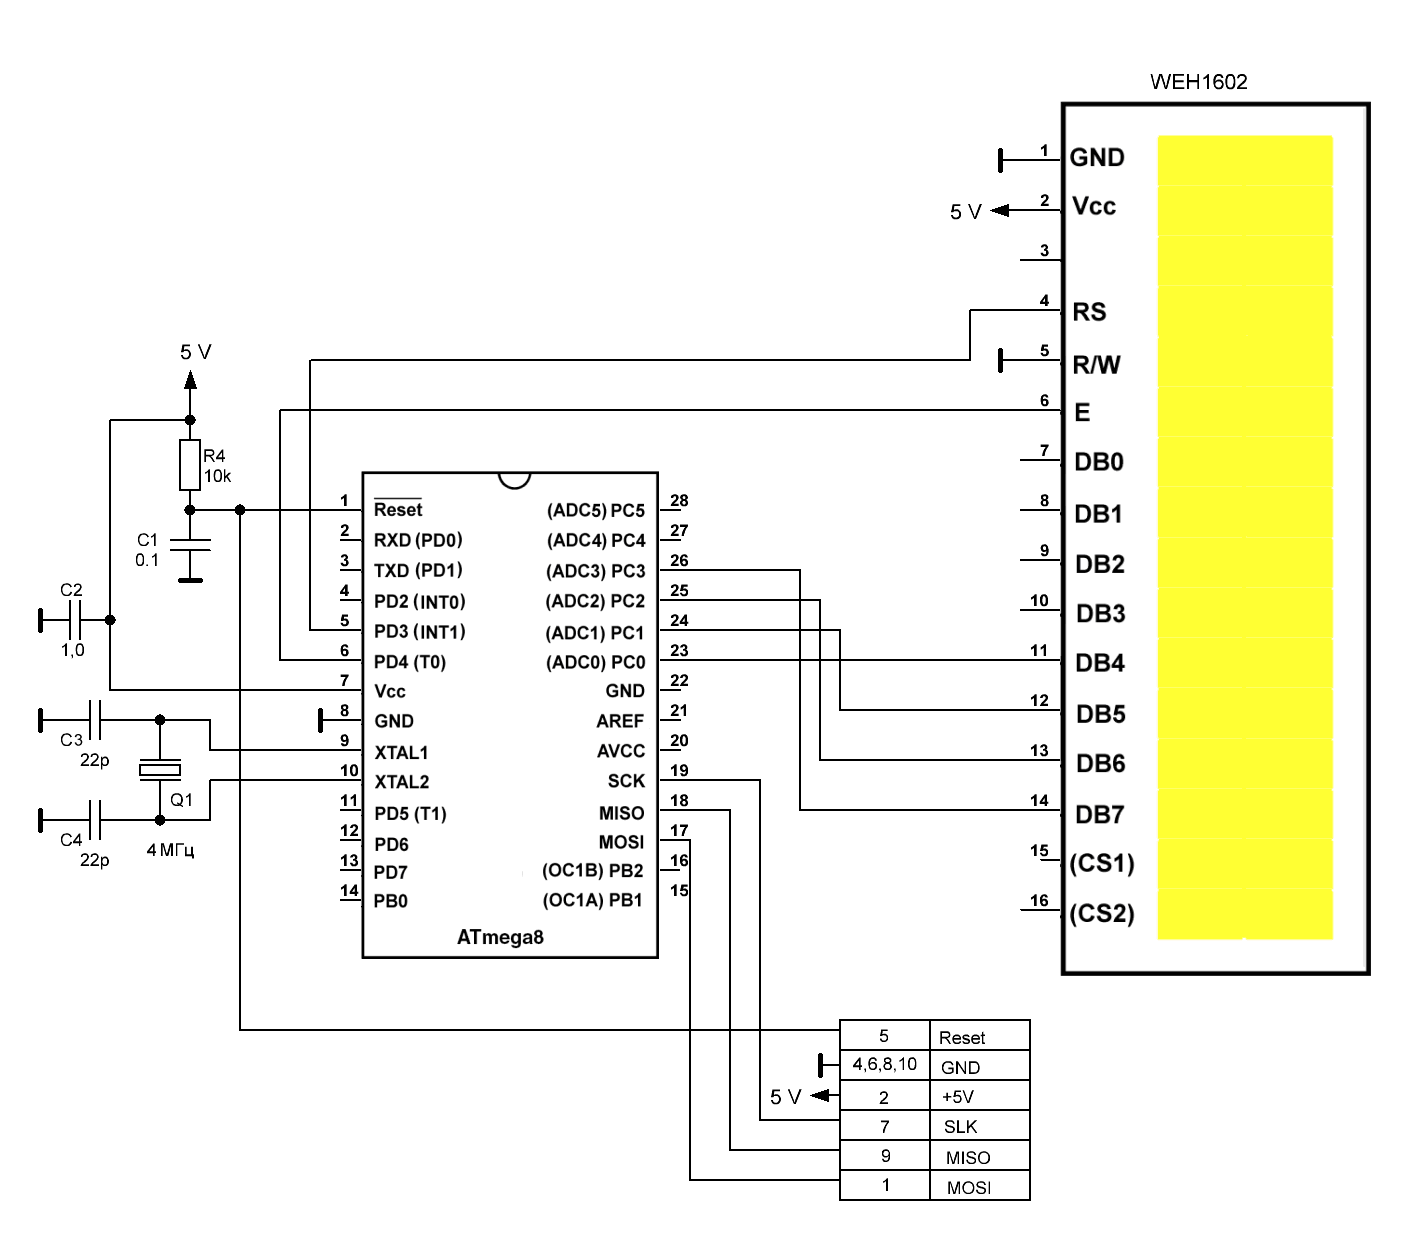 Управление LCD и OLED дисплеями на AVR-ассемблере - 3